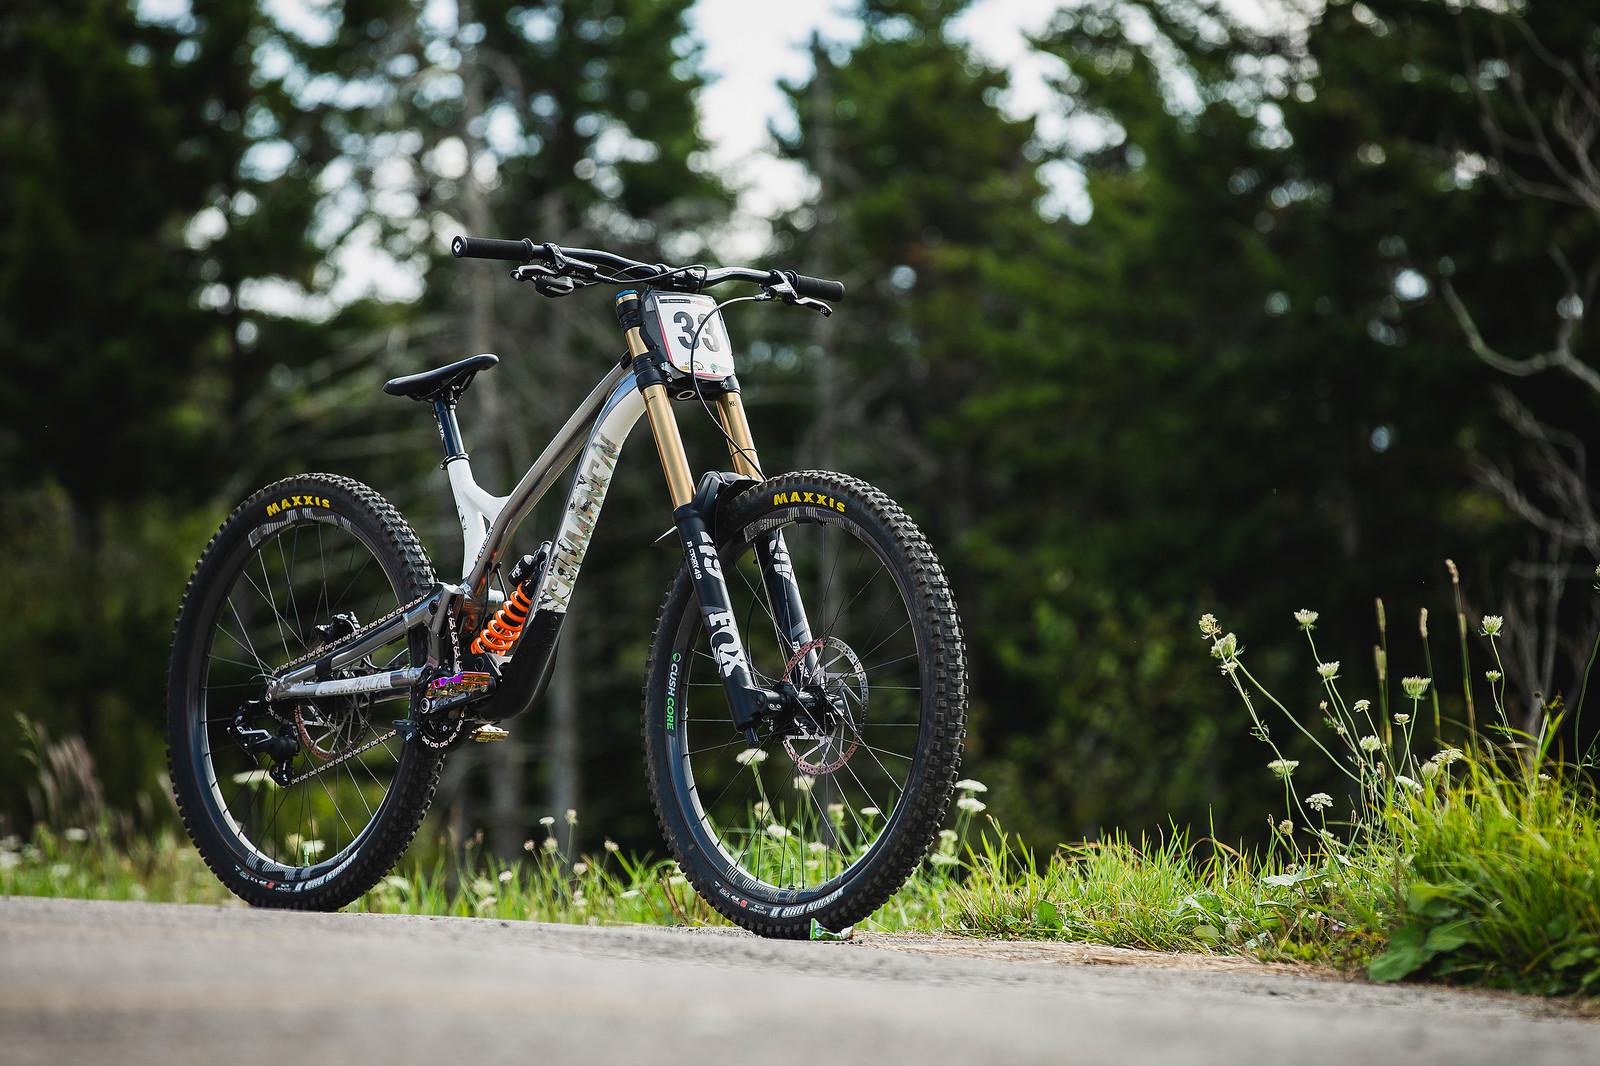 Thomas Estaque's Commencal Supreme - PIT BITS - 2019 World Cup Downhill, Snowshoe, West Virginia - Mountain Biking Pictures - Vital MTB